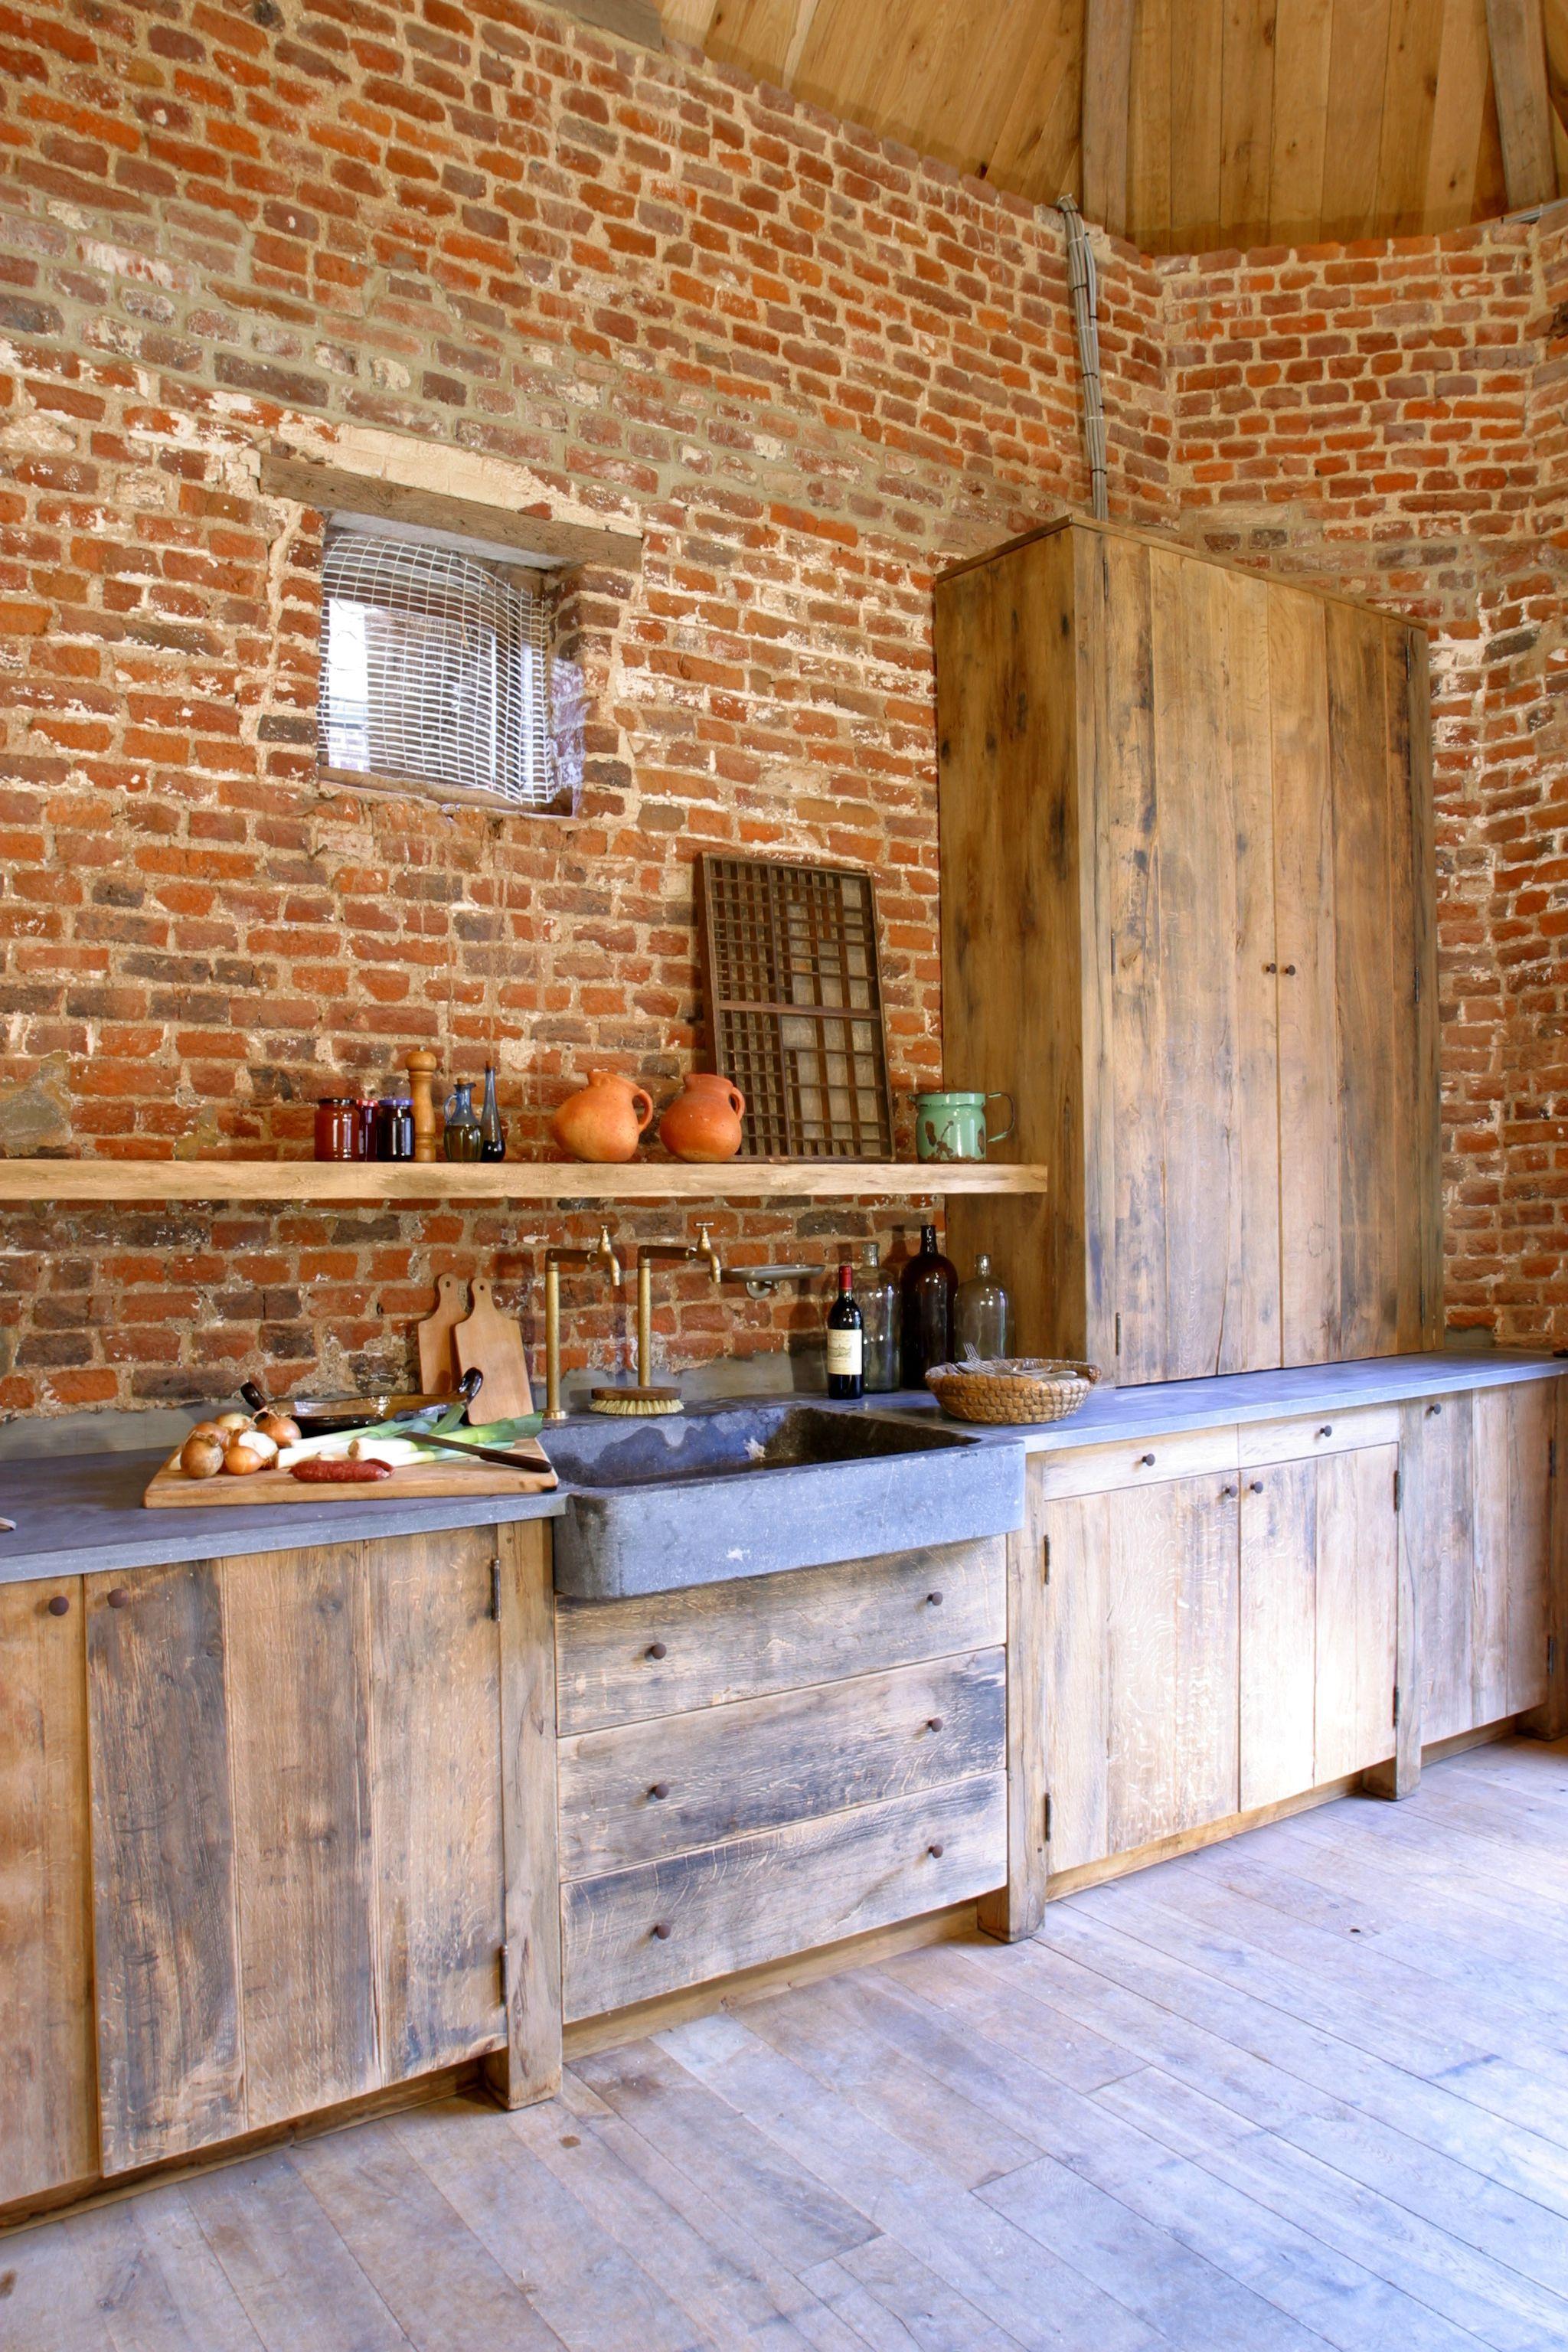 Kitchen Project By Dirk Cousaert Www Dirkcousaert Be Rustieke Keukens Keukens Rustieke Buitenkeukens